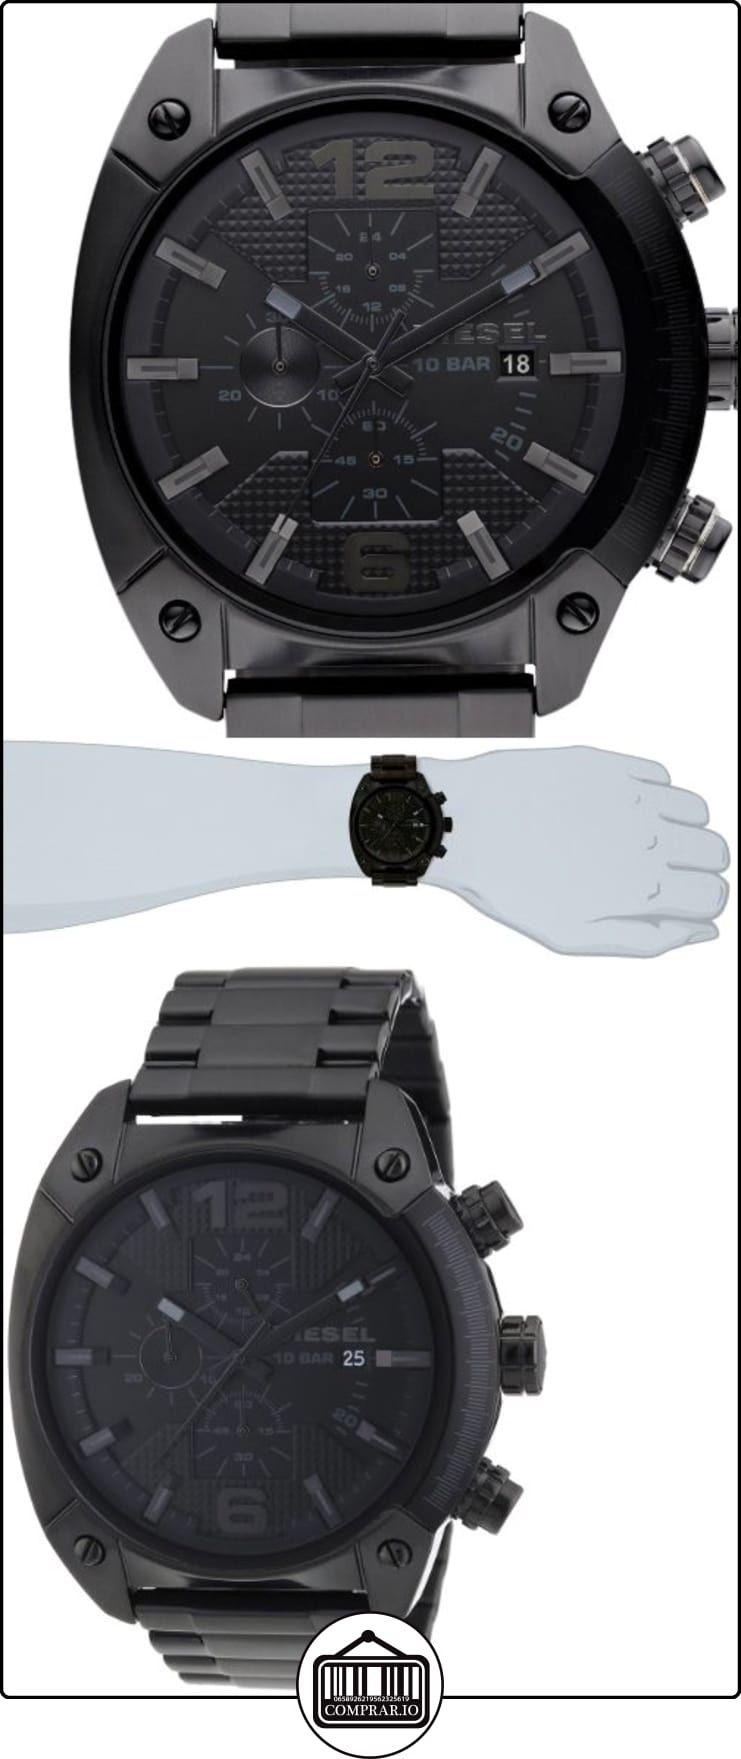 bdf158fa0e7a Diesel DZ4223 - Reloj cronógrafo de cuarzo para hombre con correa de acero  inoxidable bañado